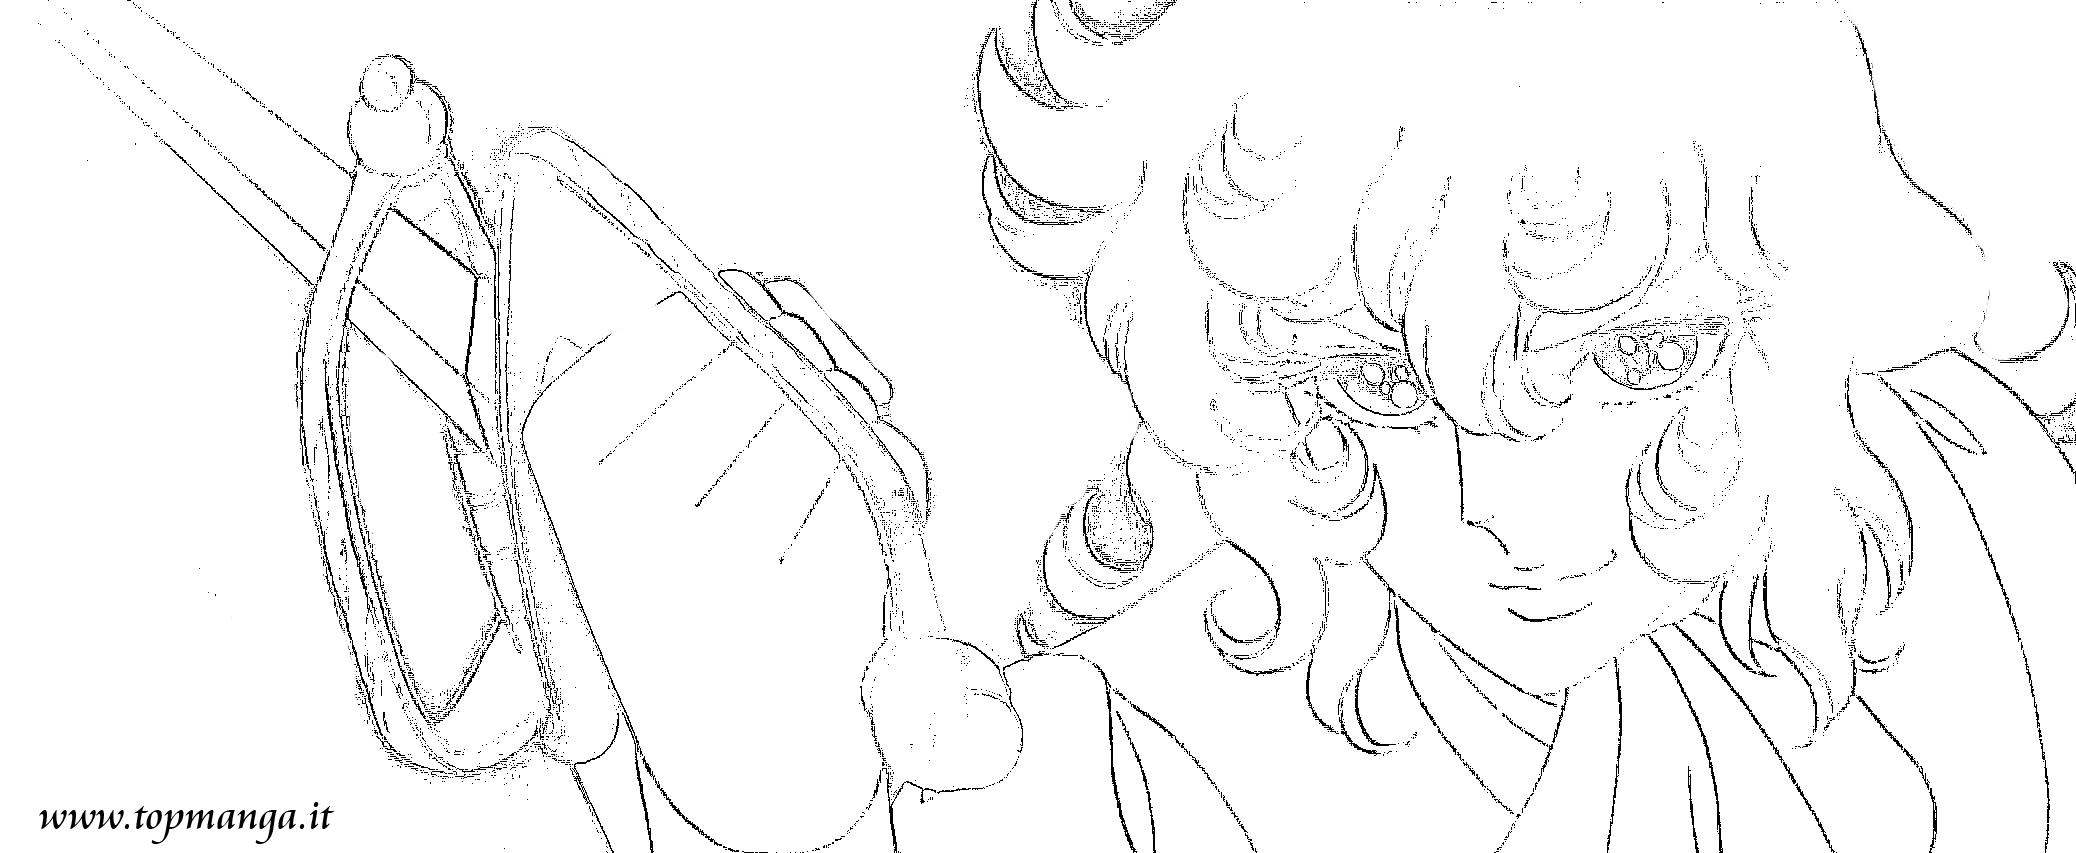 Immagini da colorare di lady oscar topmanga anime - Immagini da colorare di rose ...